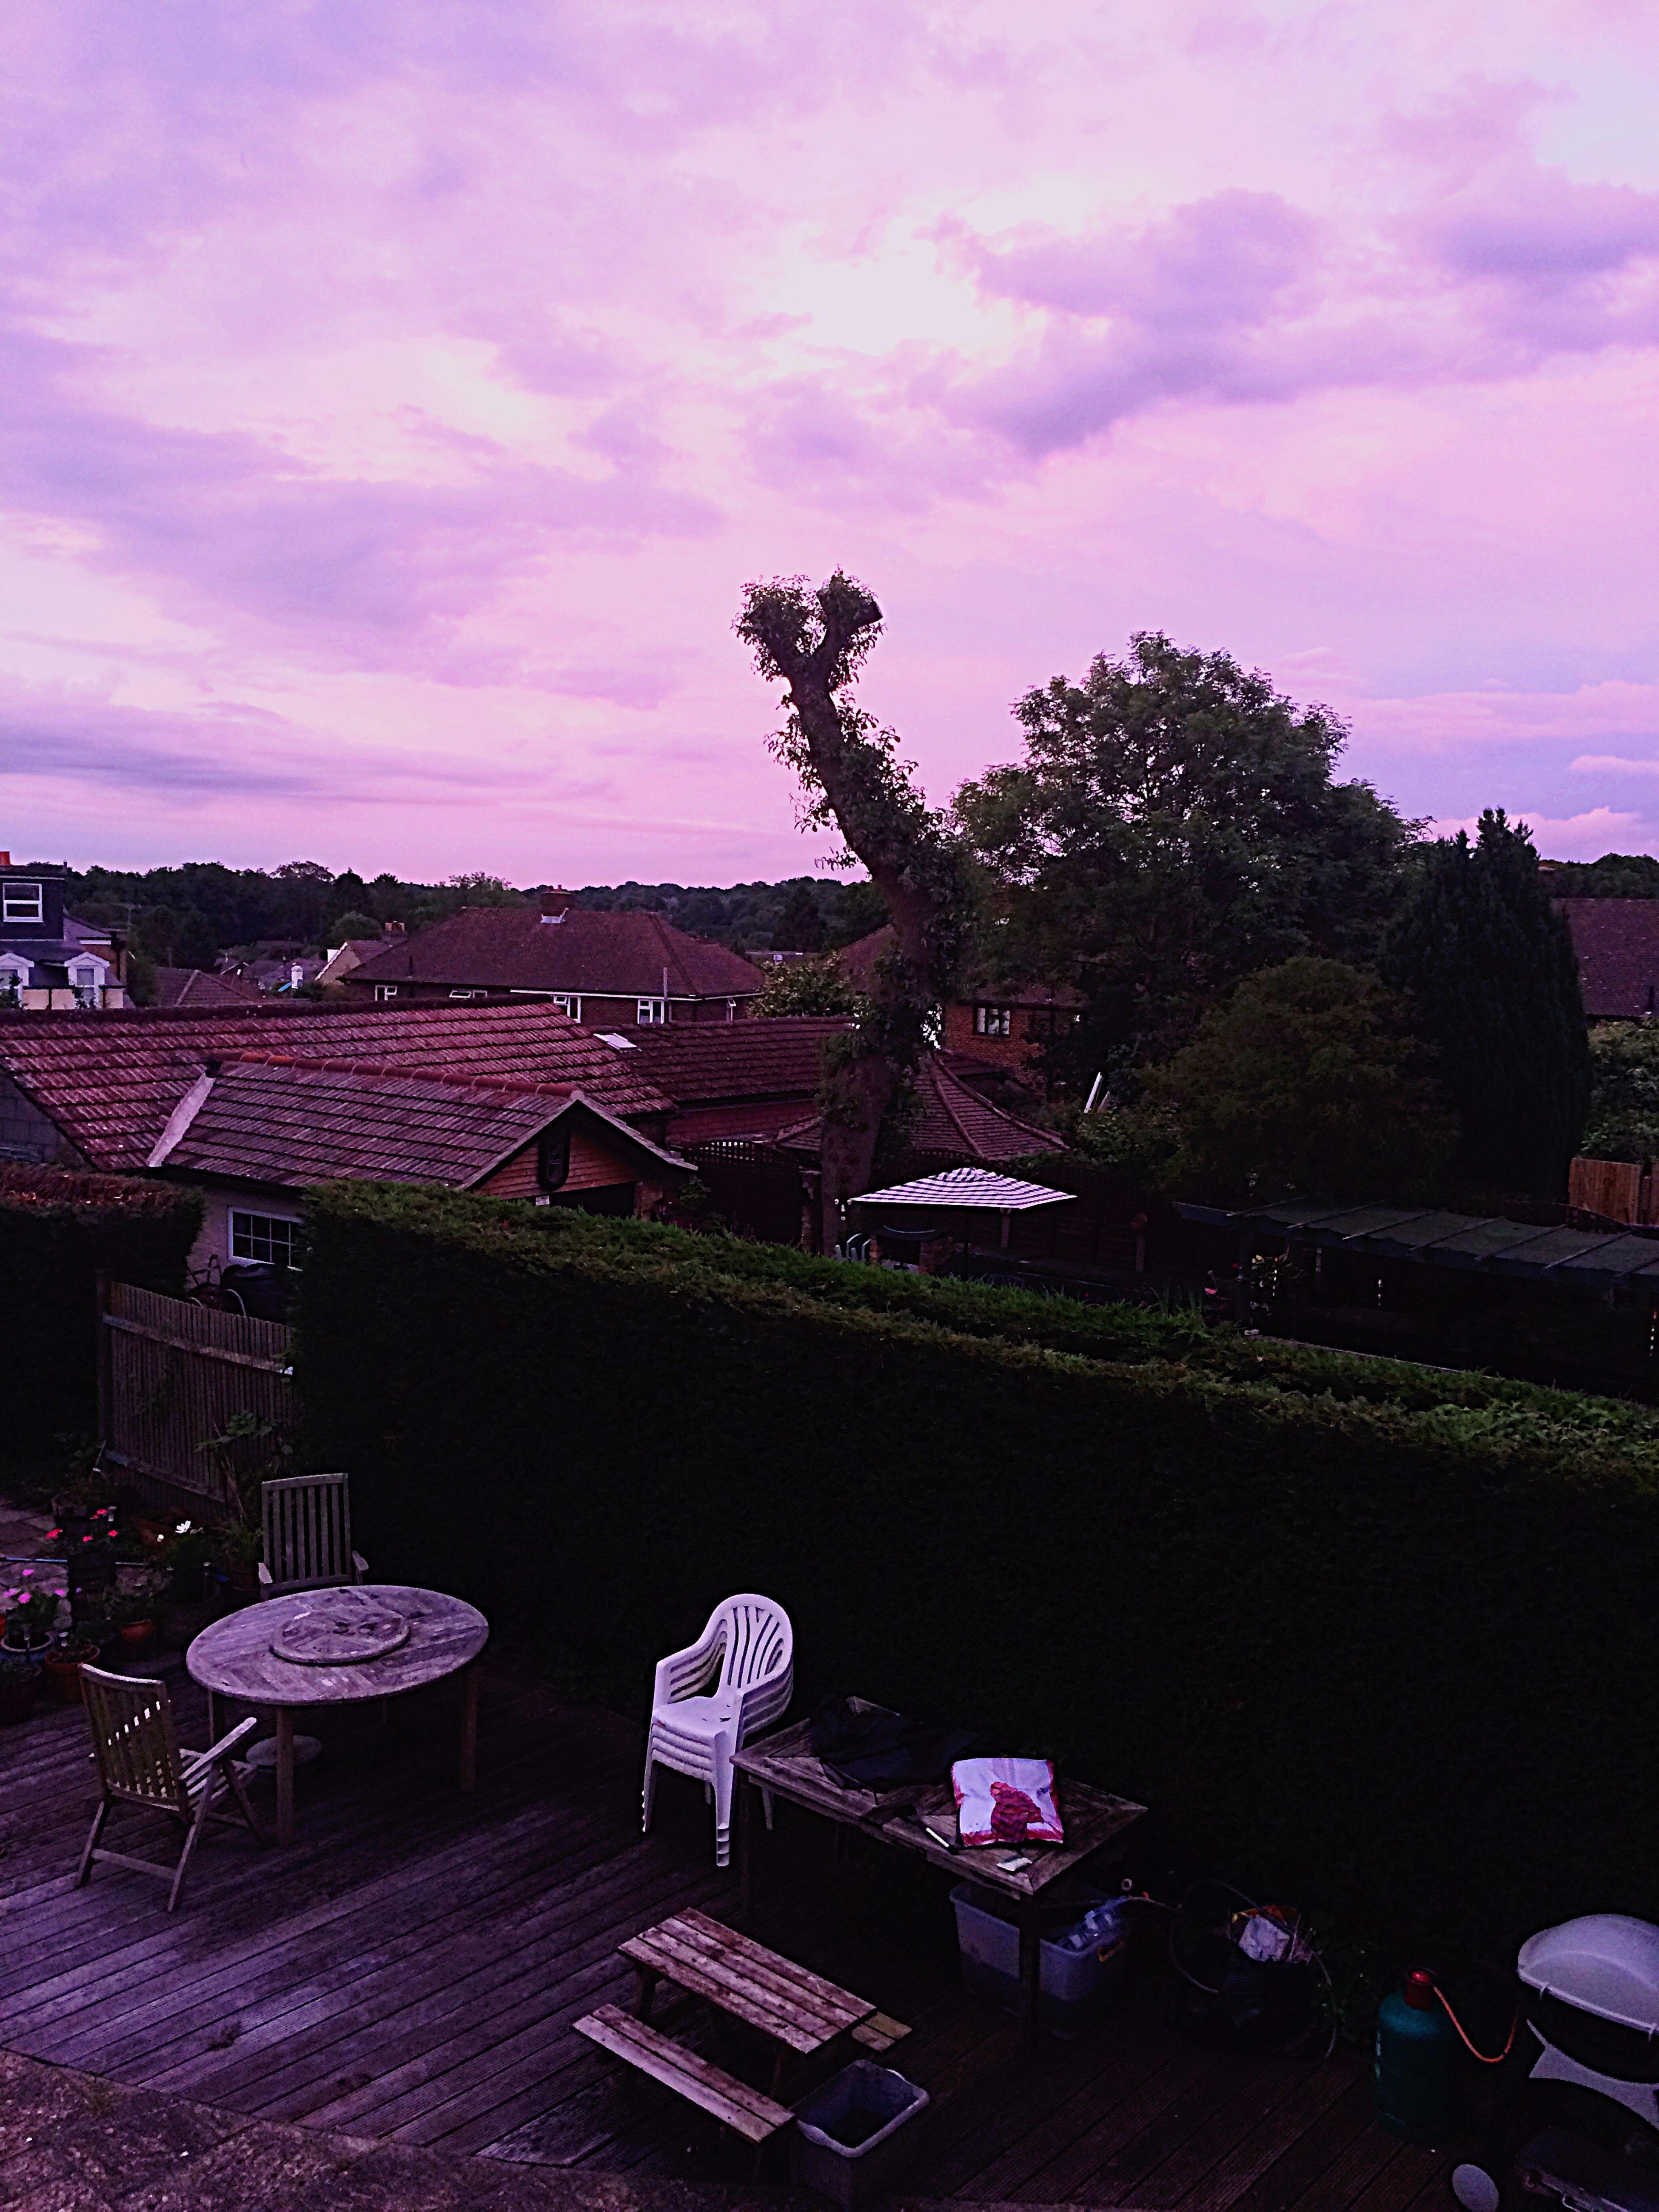 Sunset View Village Overcast